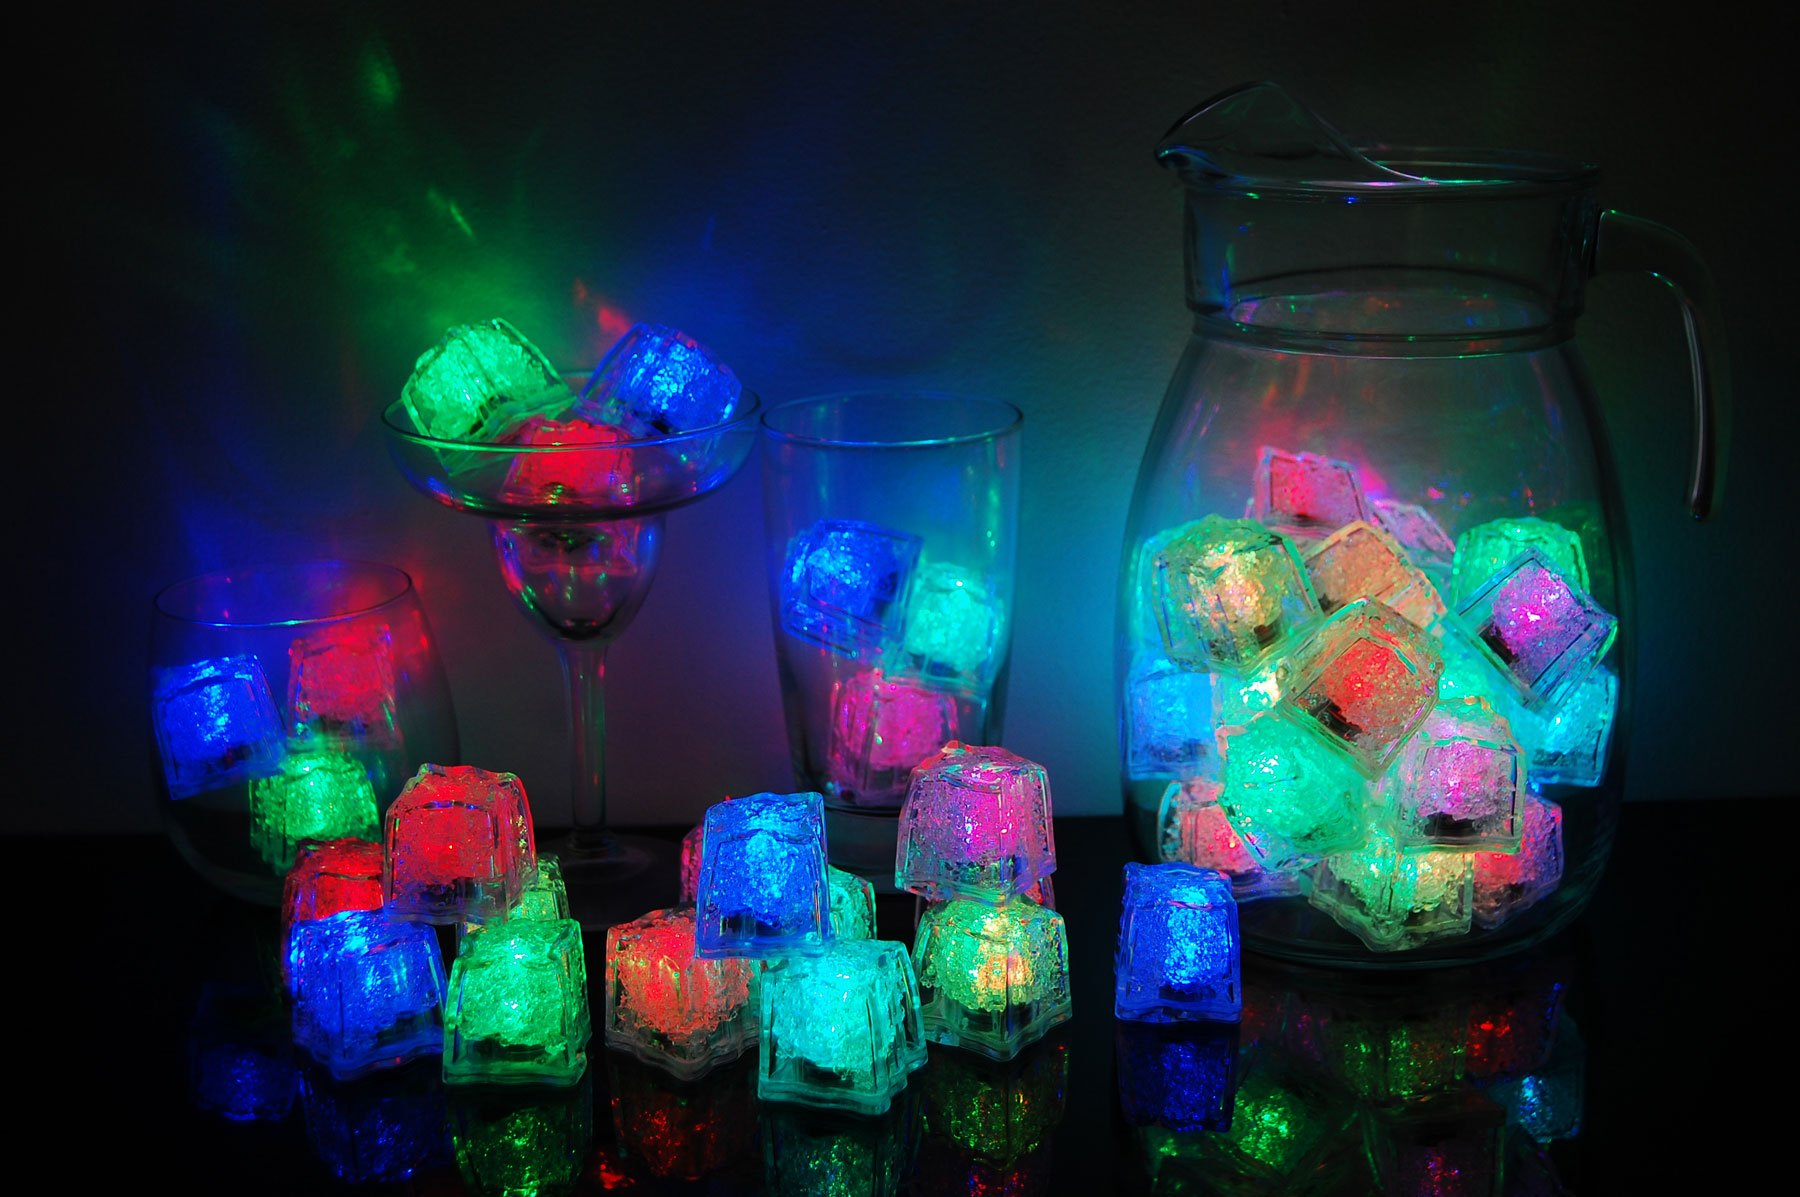 LiteCubes Set of 48 Brand 8 Mode MultiColor RAINBOW Light up LED Ice Cubes … by LiteCubes (Image #1)